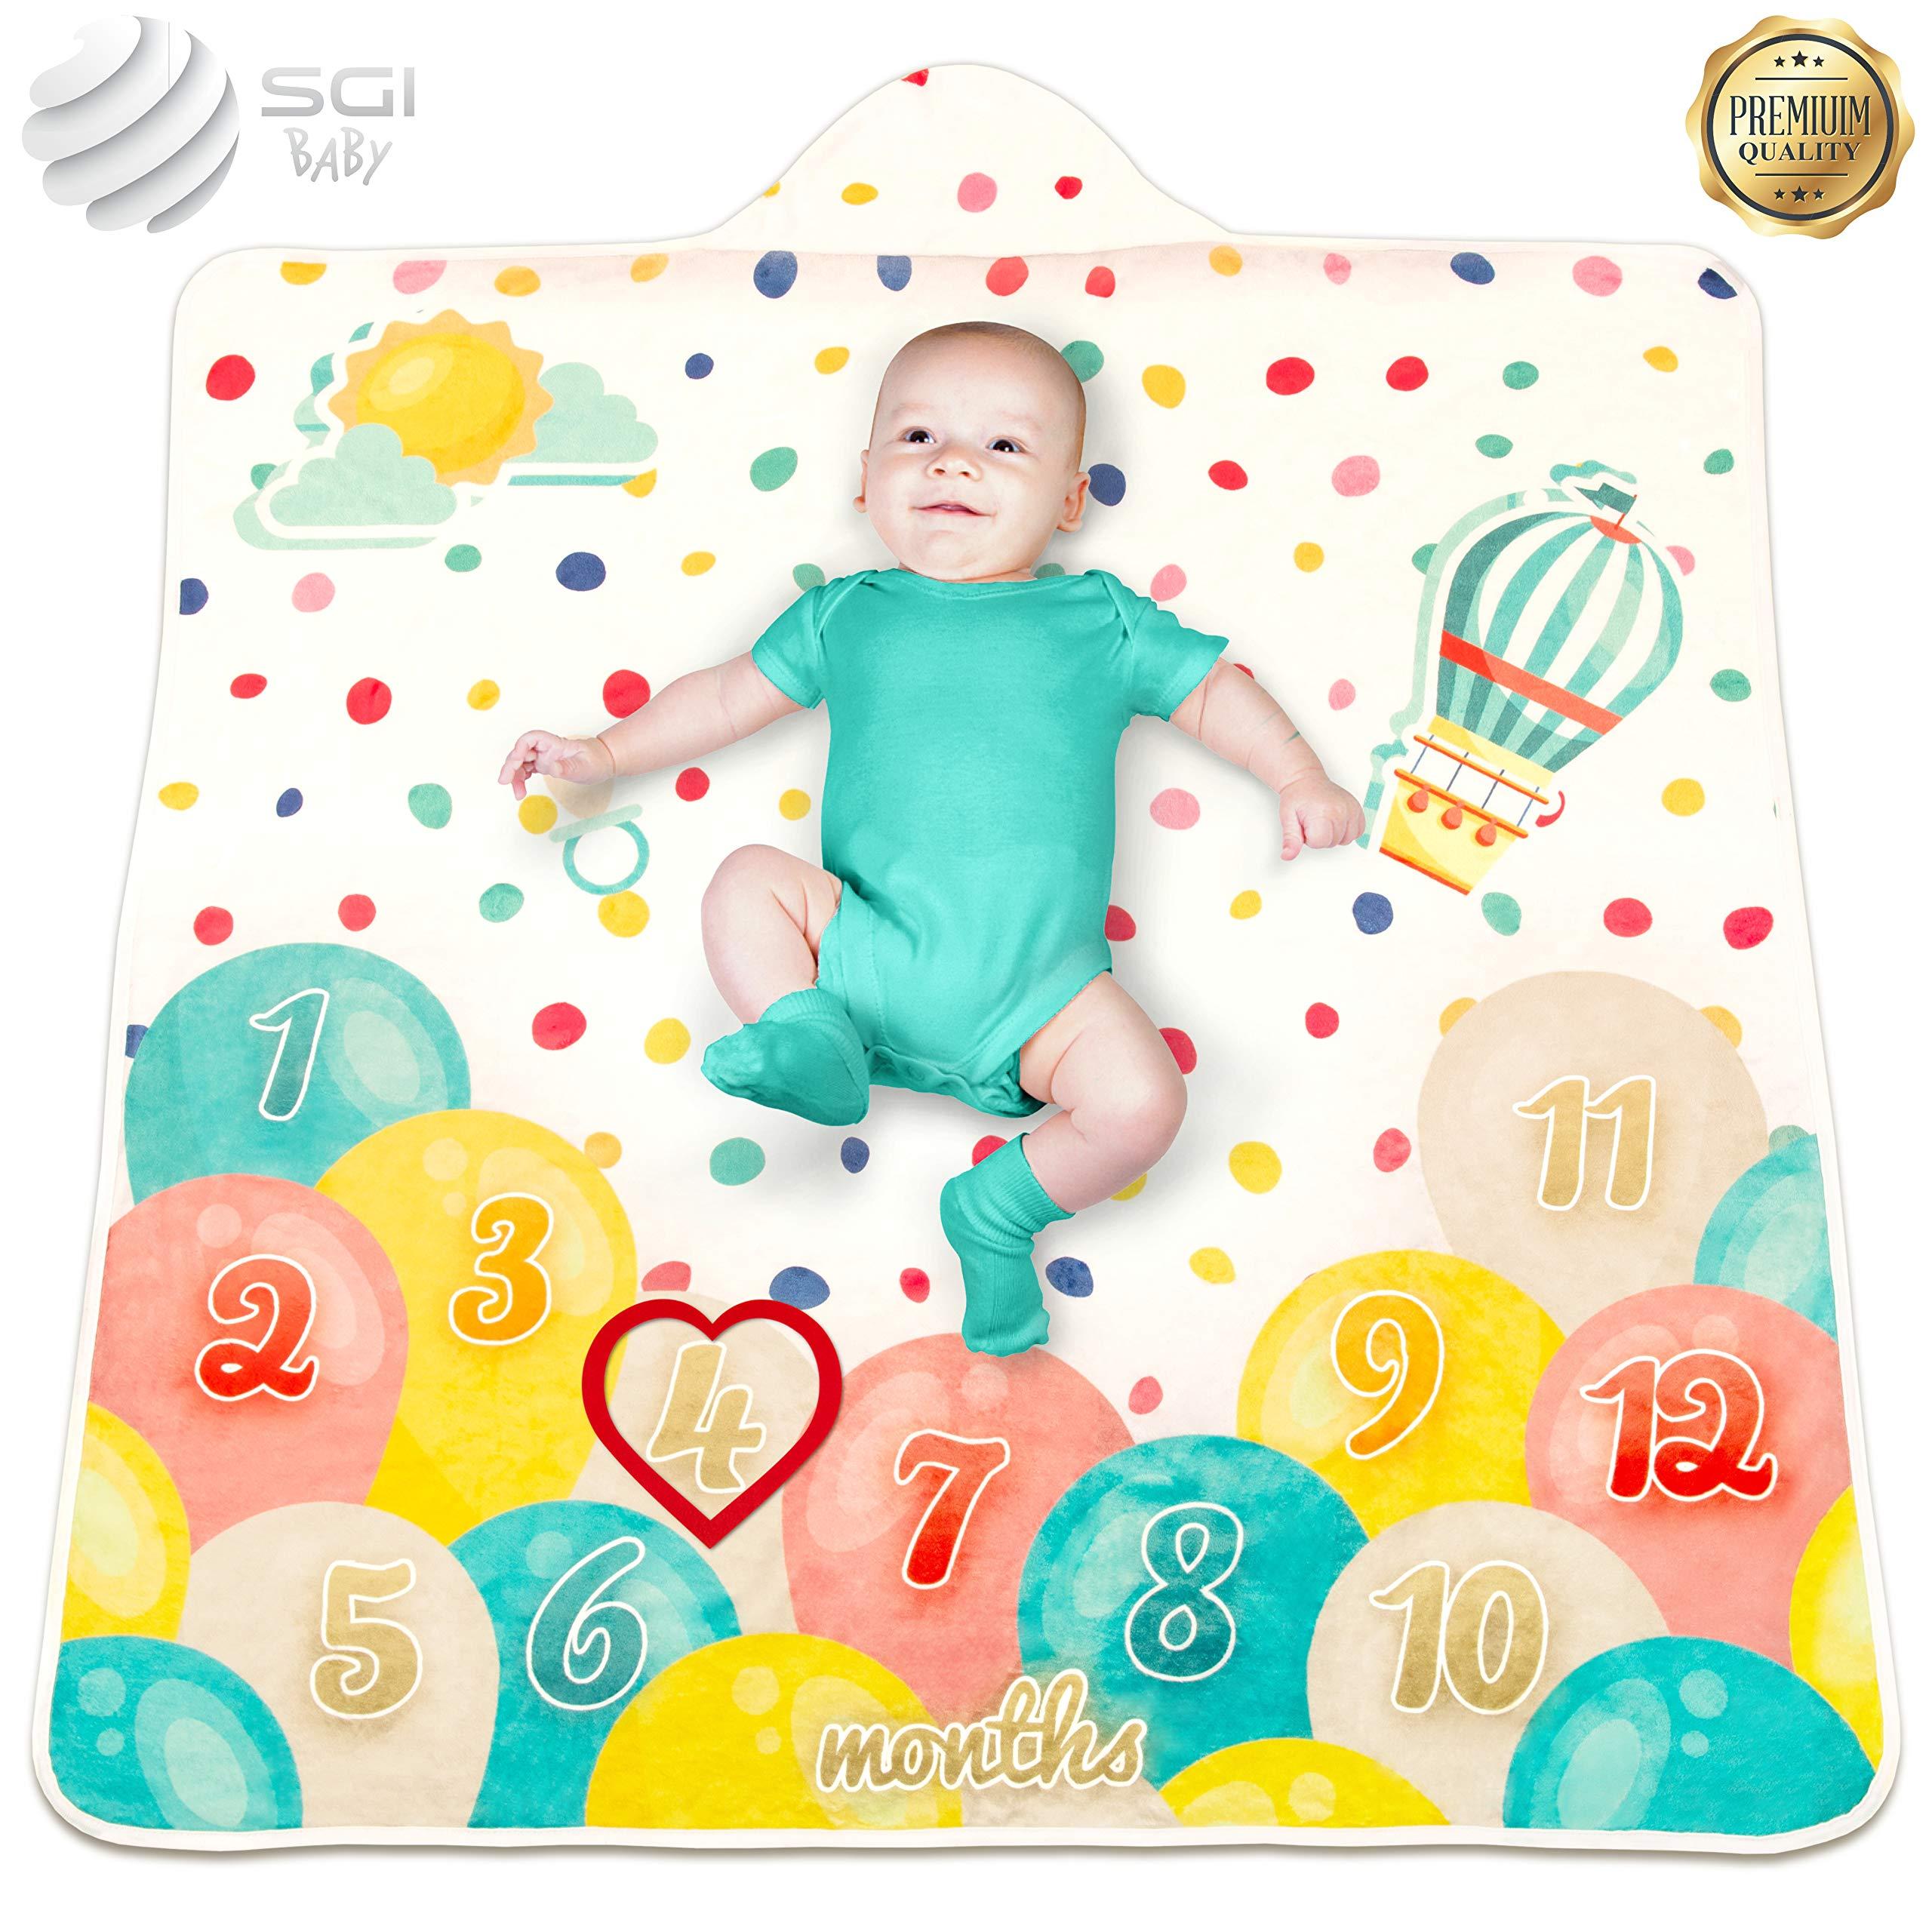 "2 in 1 - Baby Milestone Blanket - Organic Hooded Towel – Unisex Unique Monthly Blanket - Newborn Gift – 47"" x 47"""